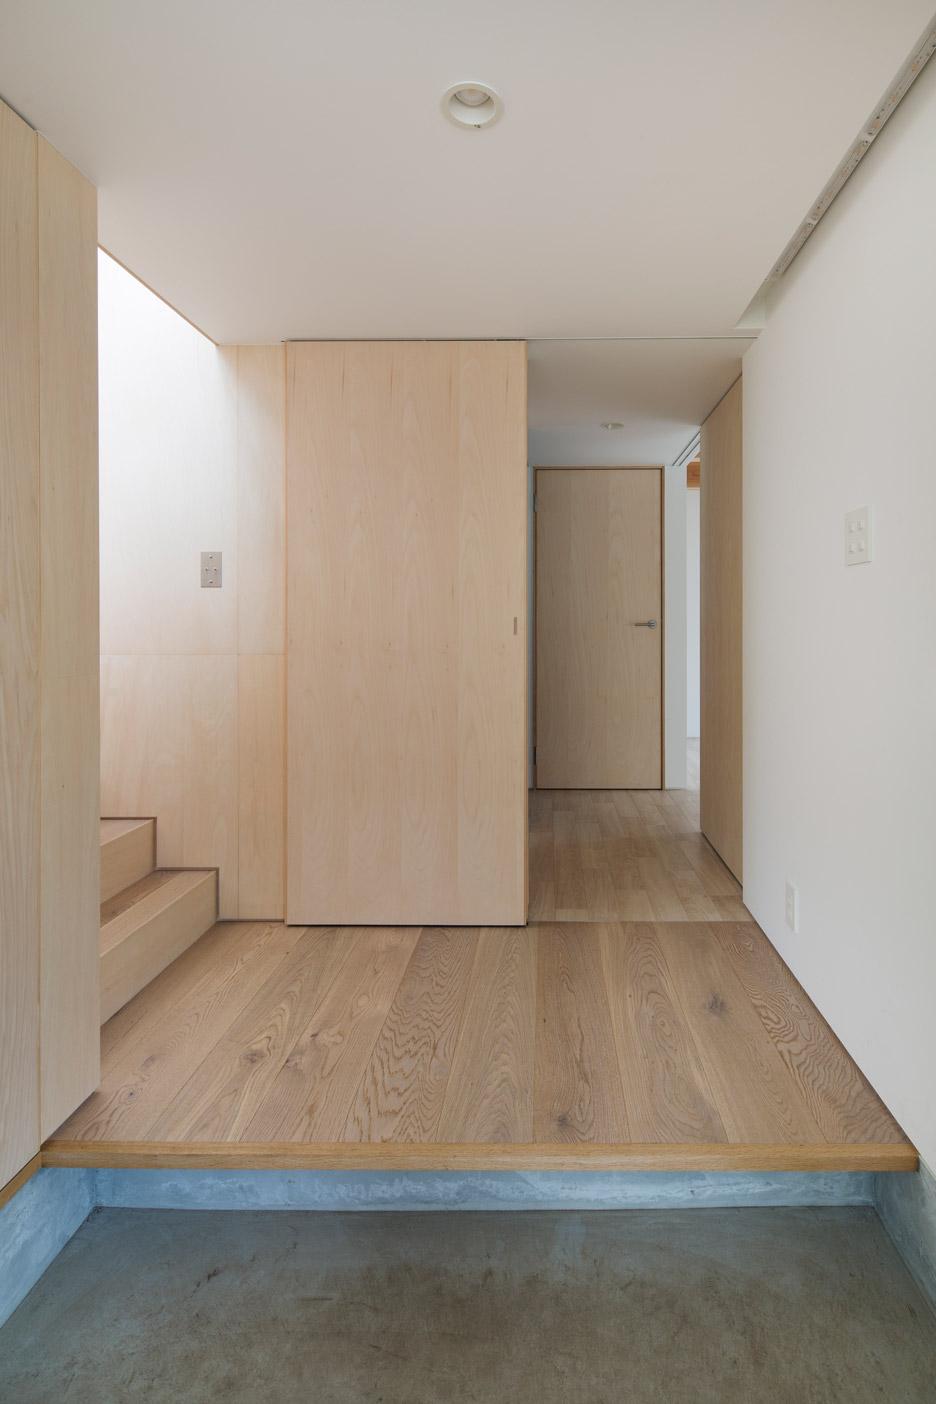 module-grid-house-tetsuo-yamaji-architects-kanto-japan_dezeen_936_2